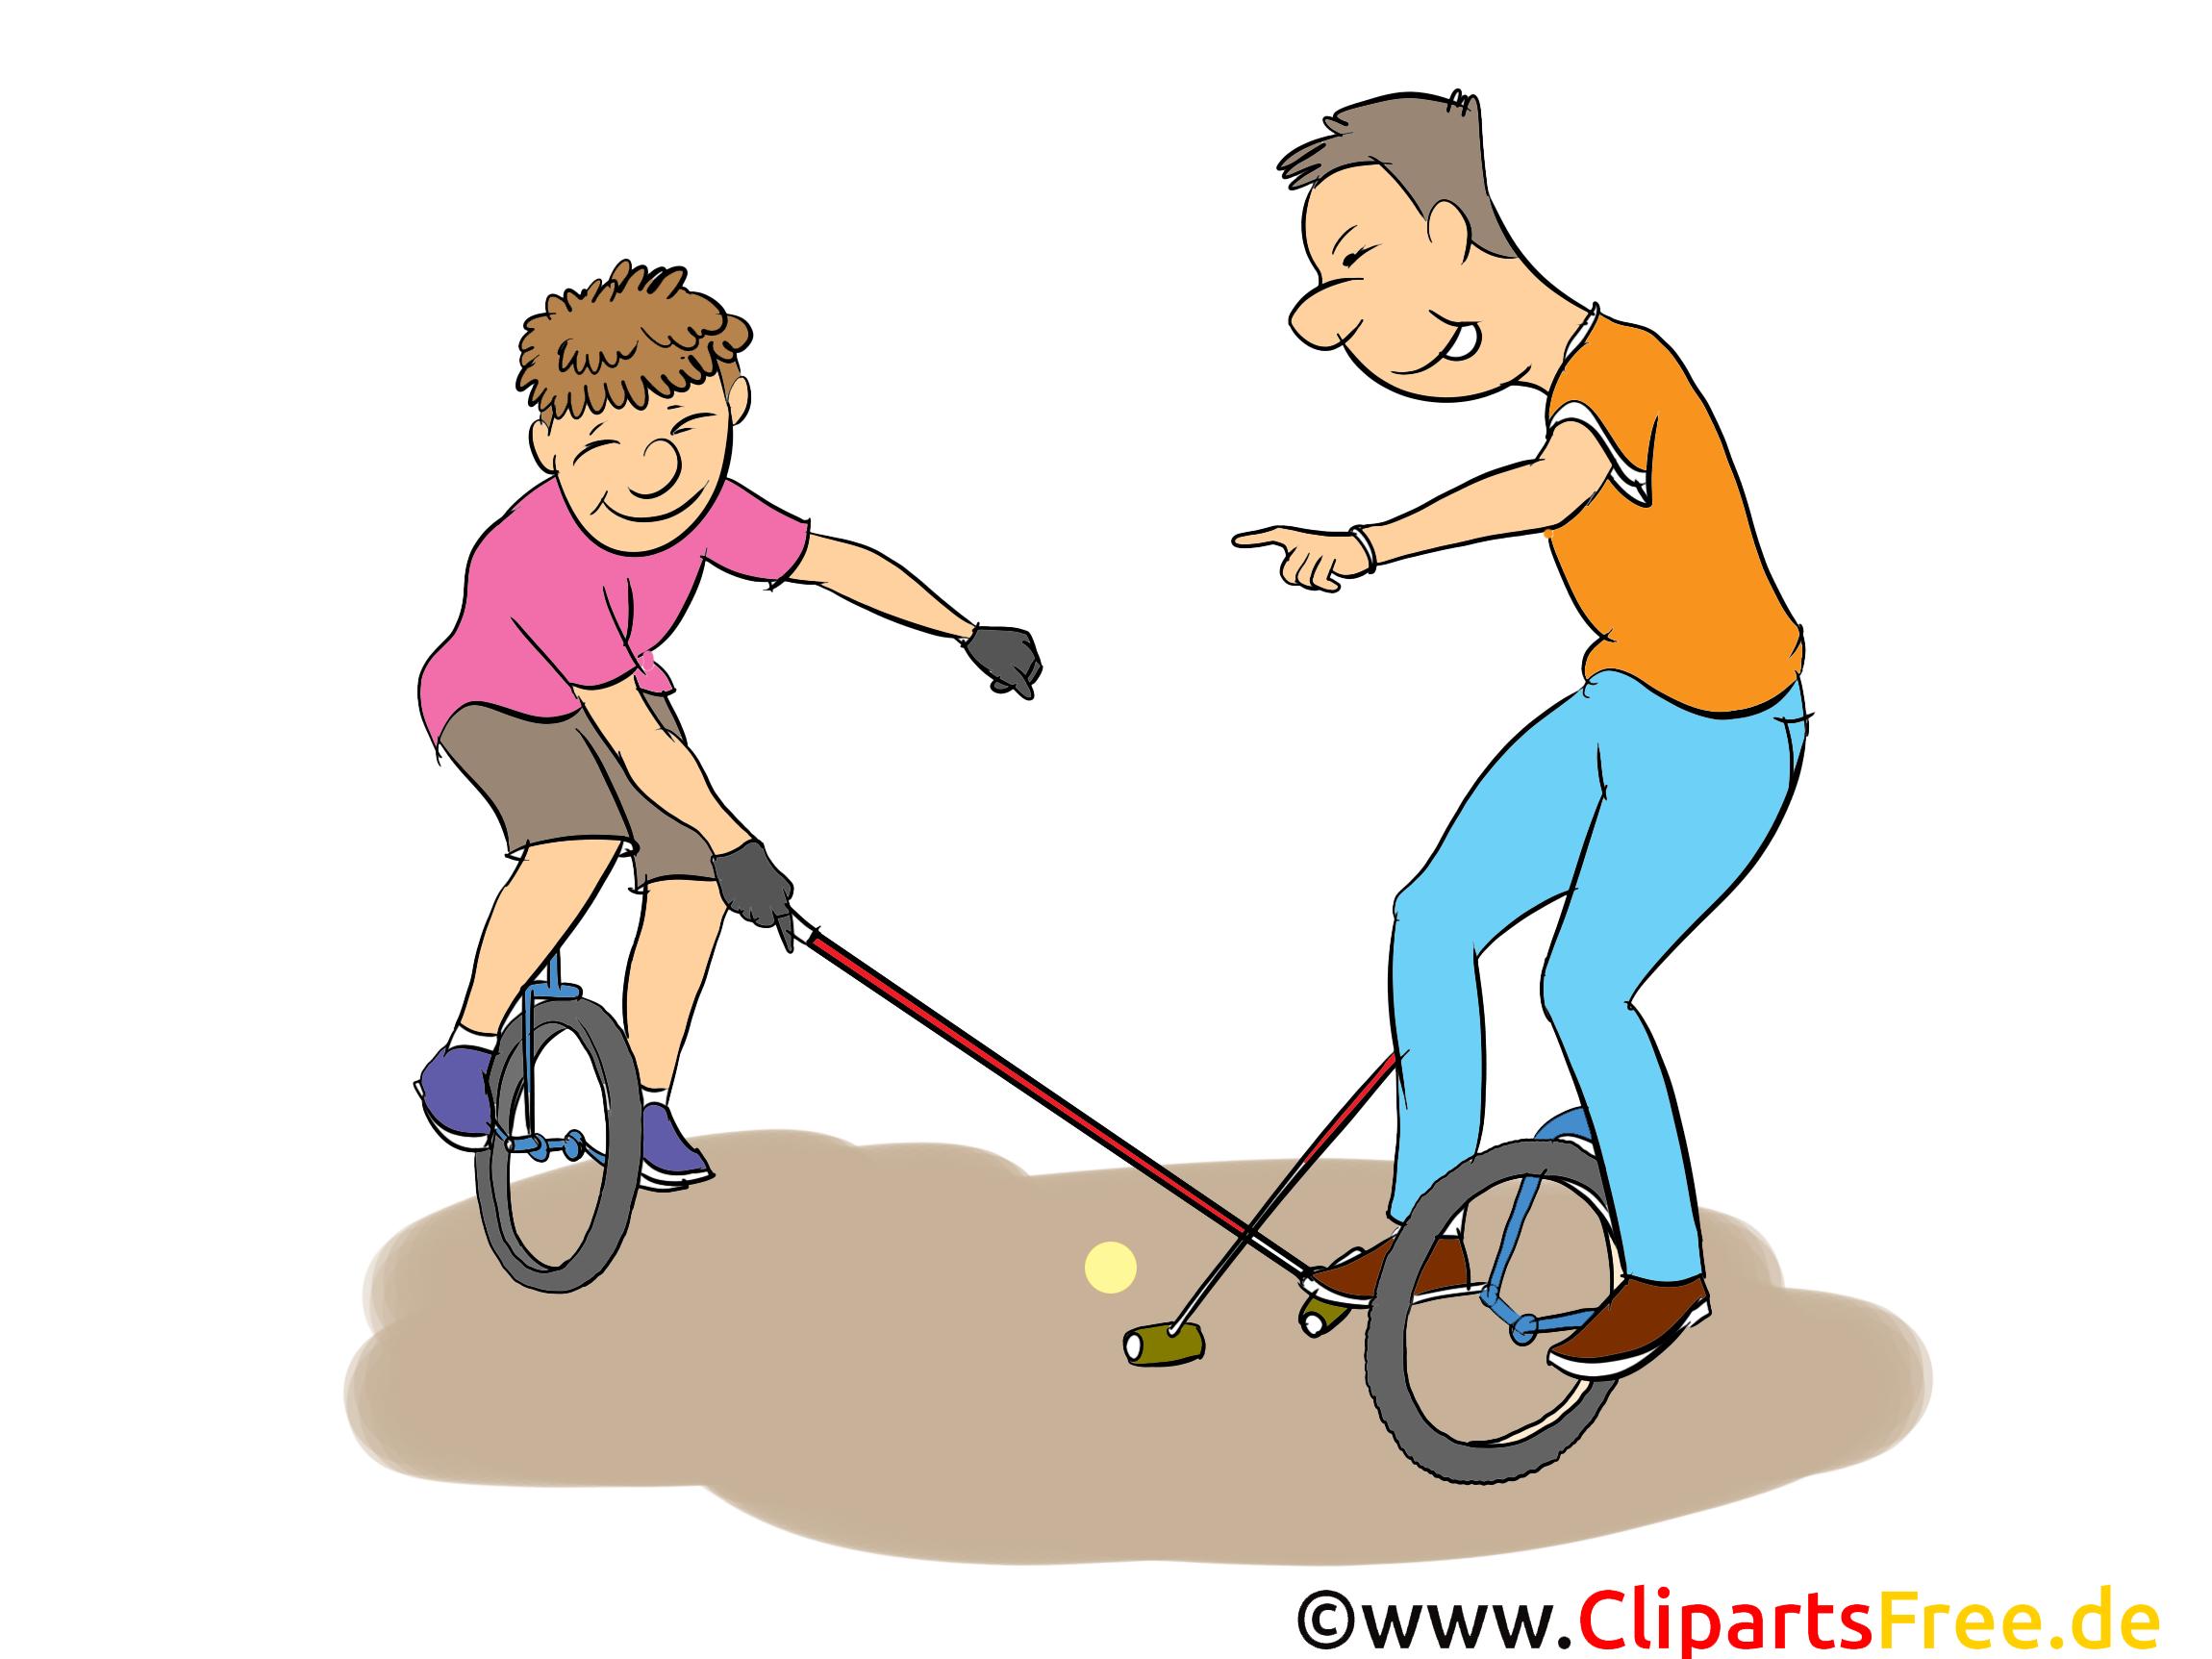 Fahrrad-Polo Cartoon, Clipart, Bild, Comic, Illustration